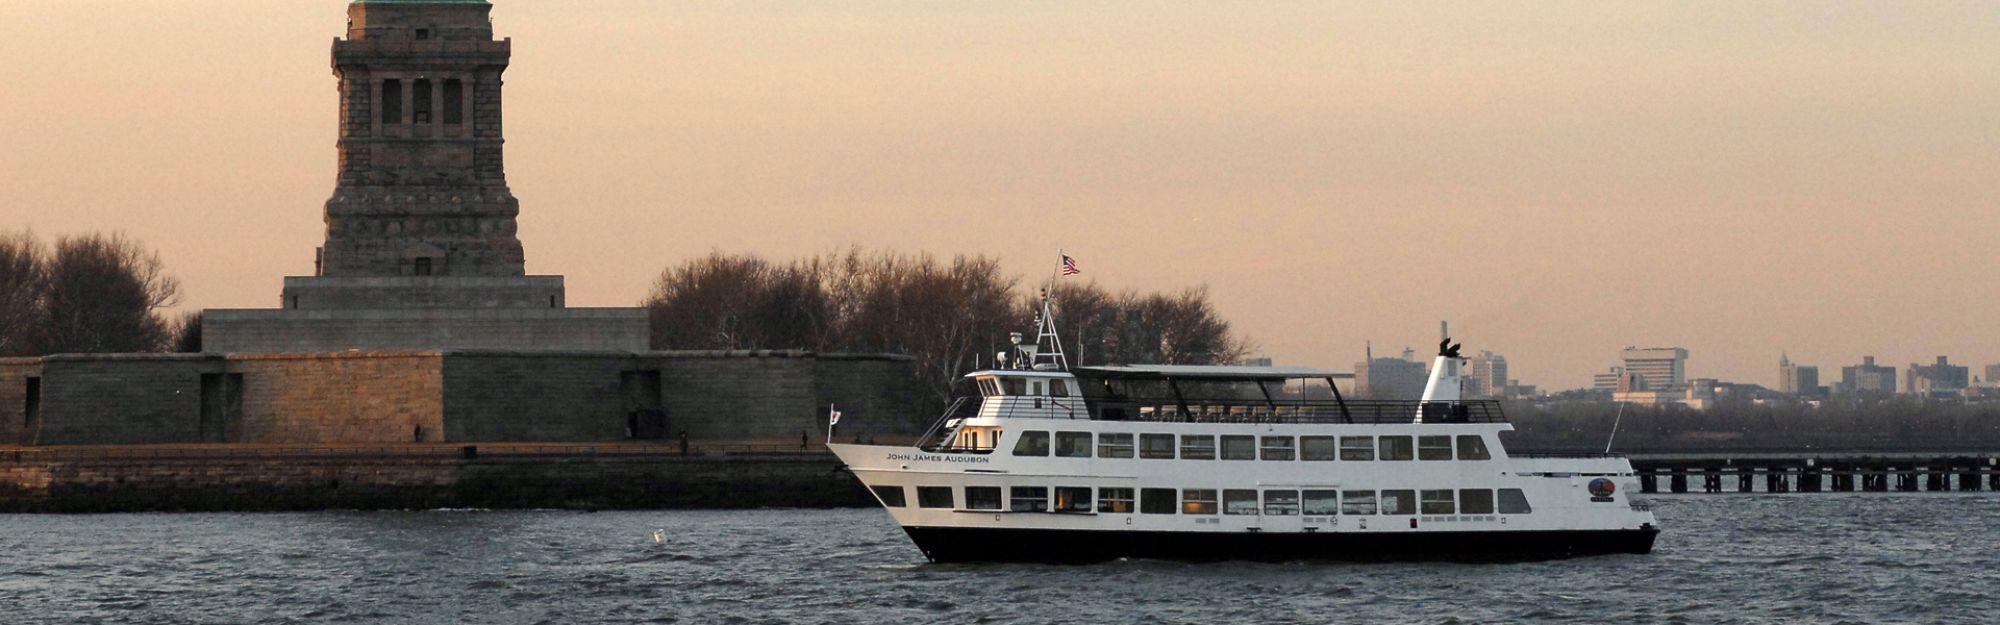 New York Downtown Loop + Statue of Liberty & Ellis Island Ferry